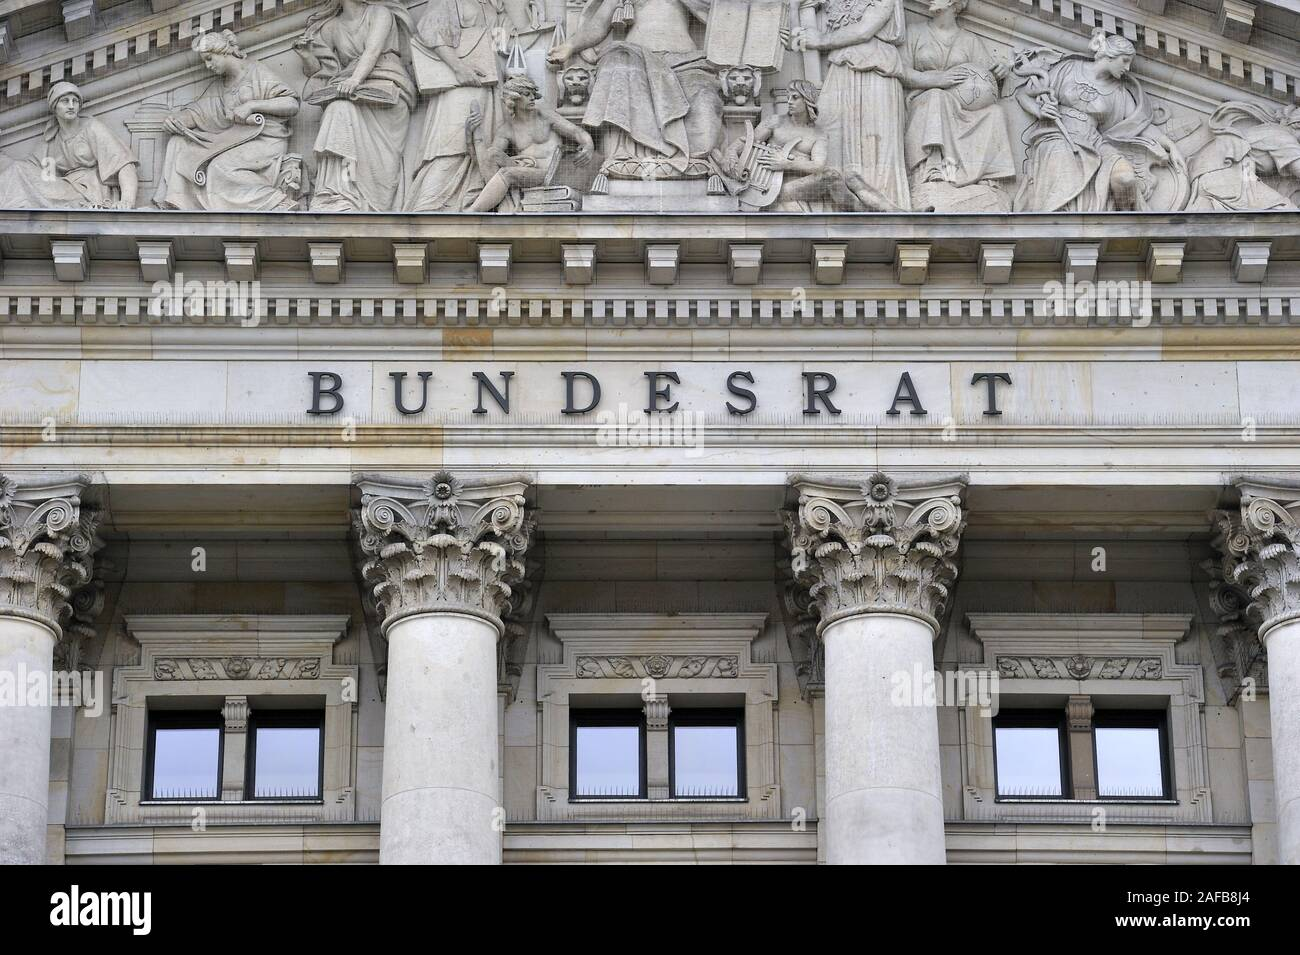 Schriftzug Bundesrat im Giebel, Tympanon ueber dem Gebaeude Hauptportal des des Bundesrat en Berlín, Alemania, Europa Foto de stock